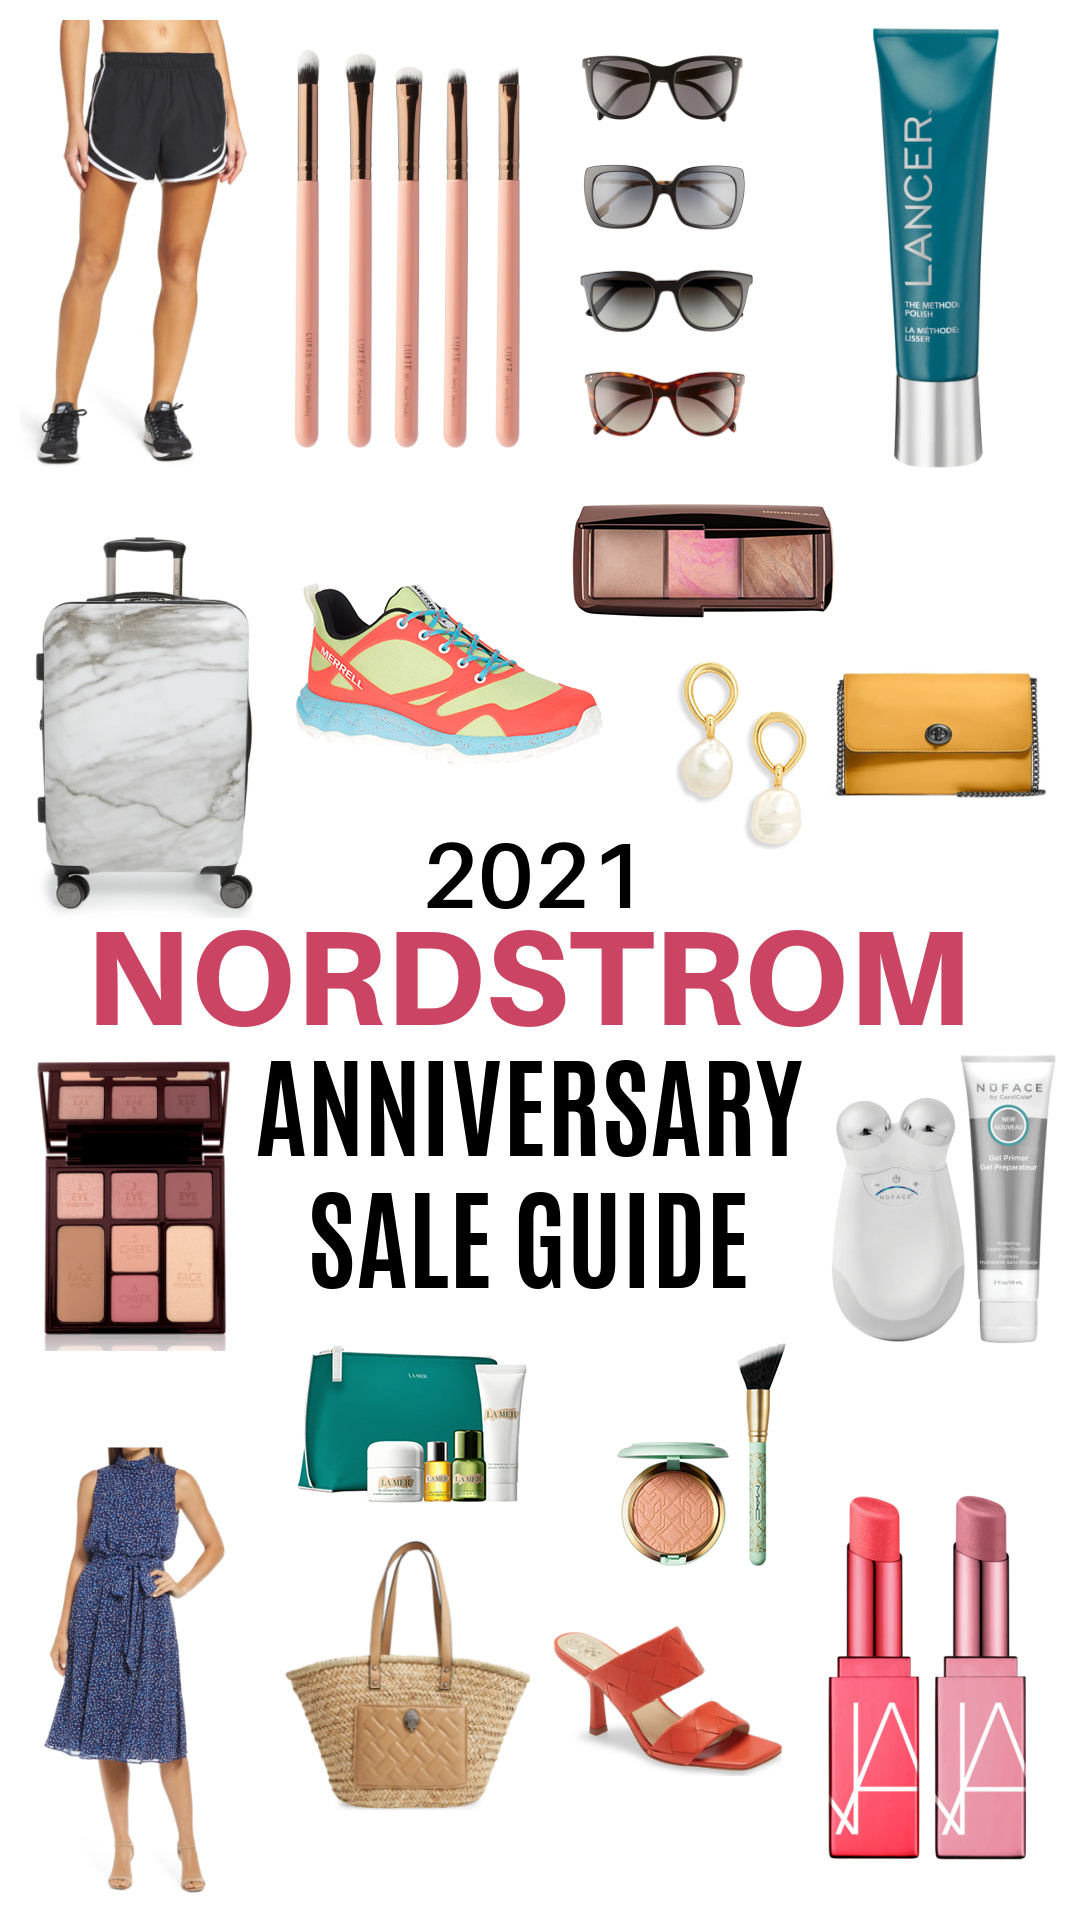 2021 Nordstrom Anniversary Sale Guide I DreaminLace.com